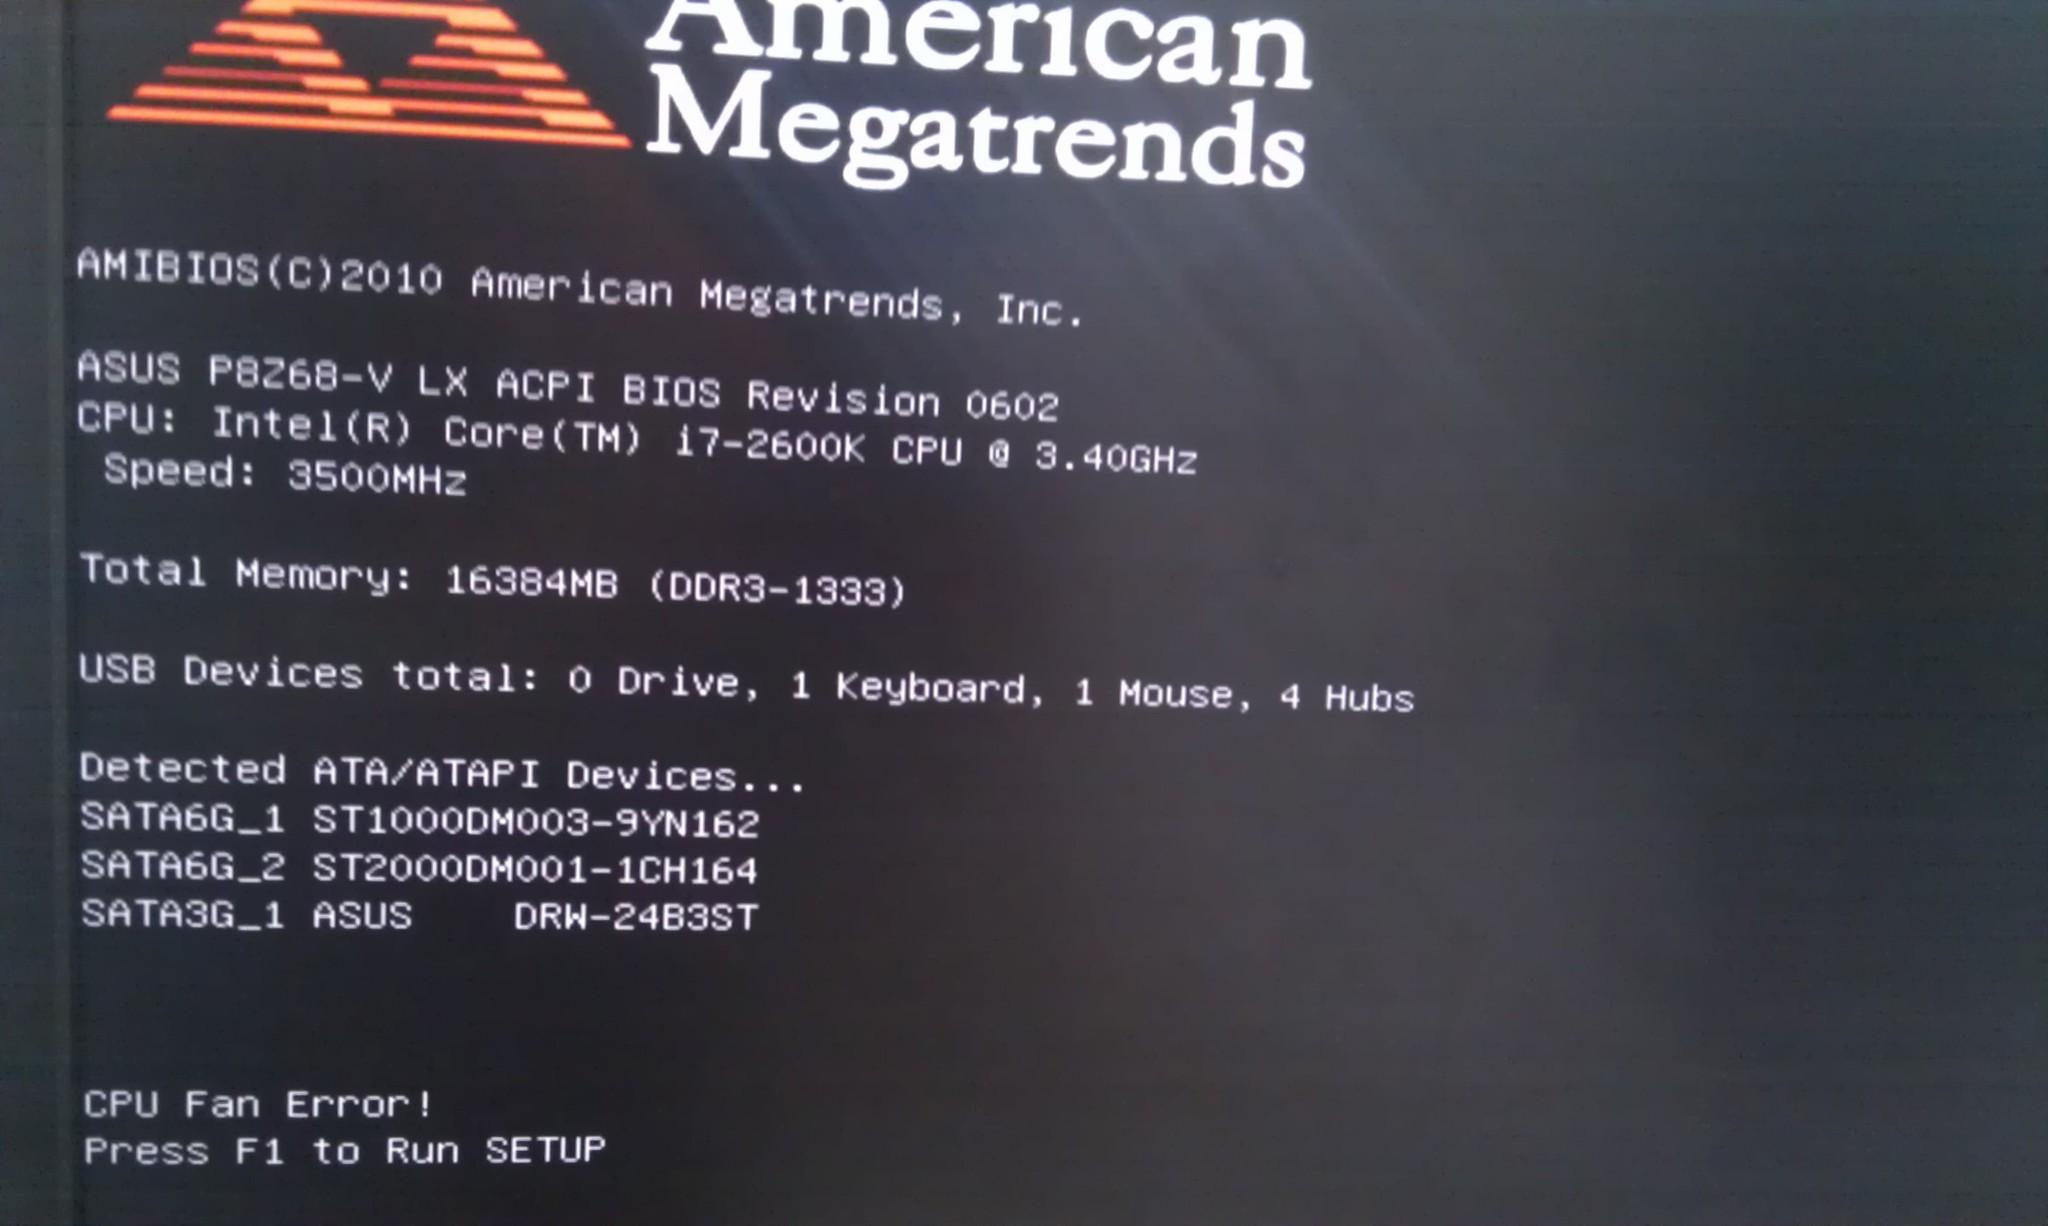 CPU Fan Error when downloading: reasons, how to fix the error 78